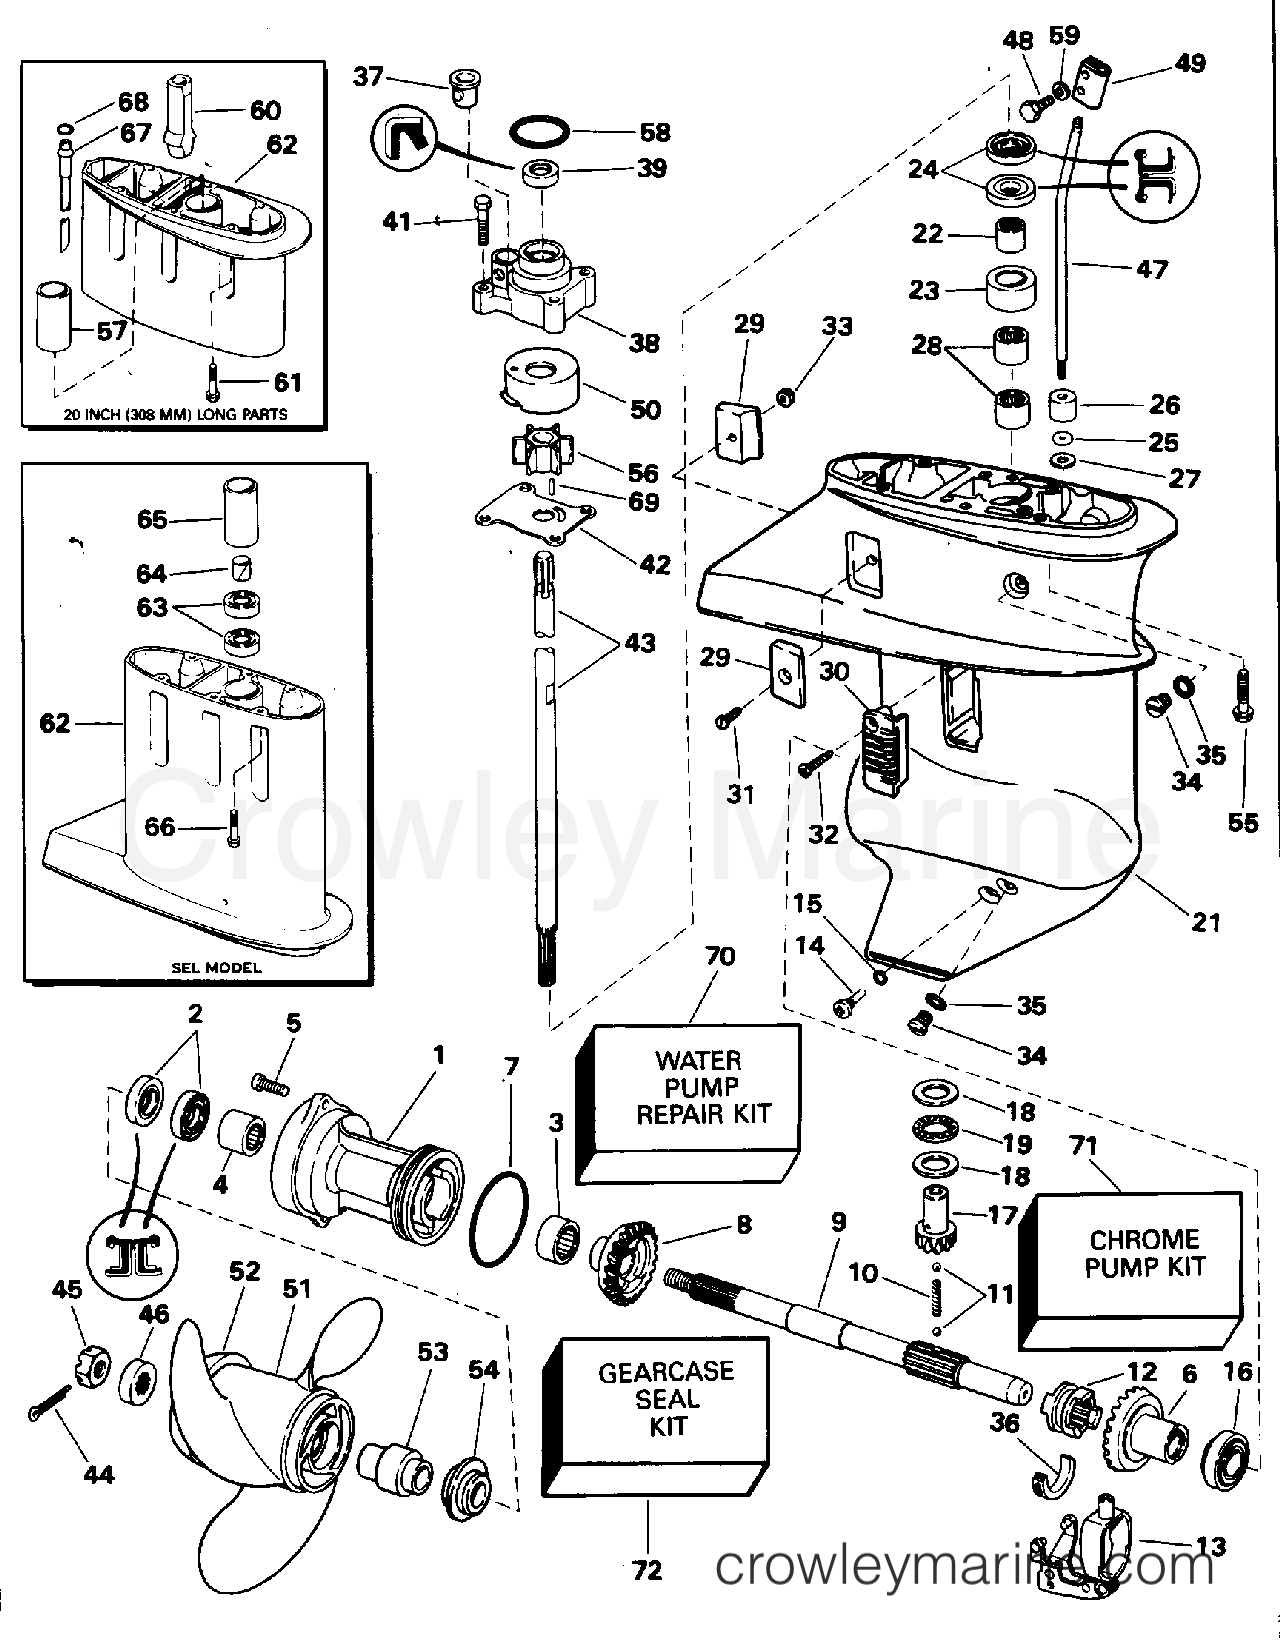 1994 Evinrude Outboards 9.9 - E10ELERB GEARCASE section